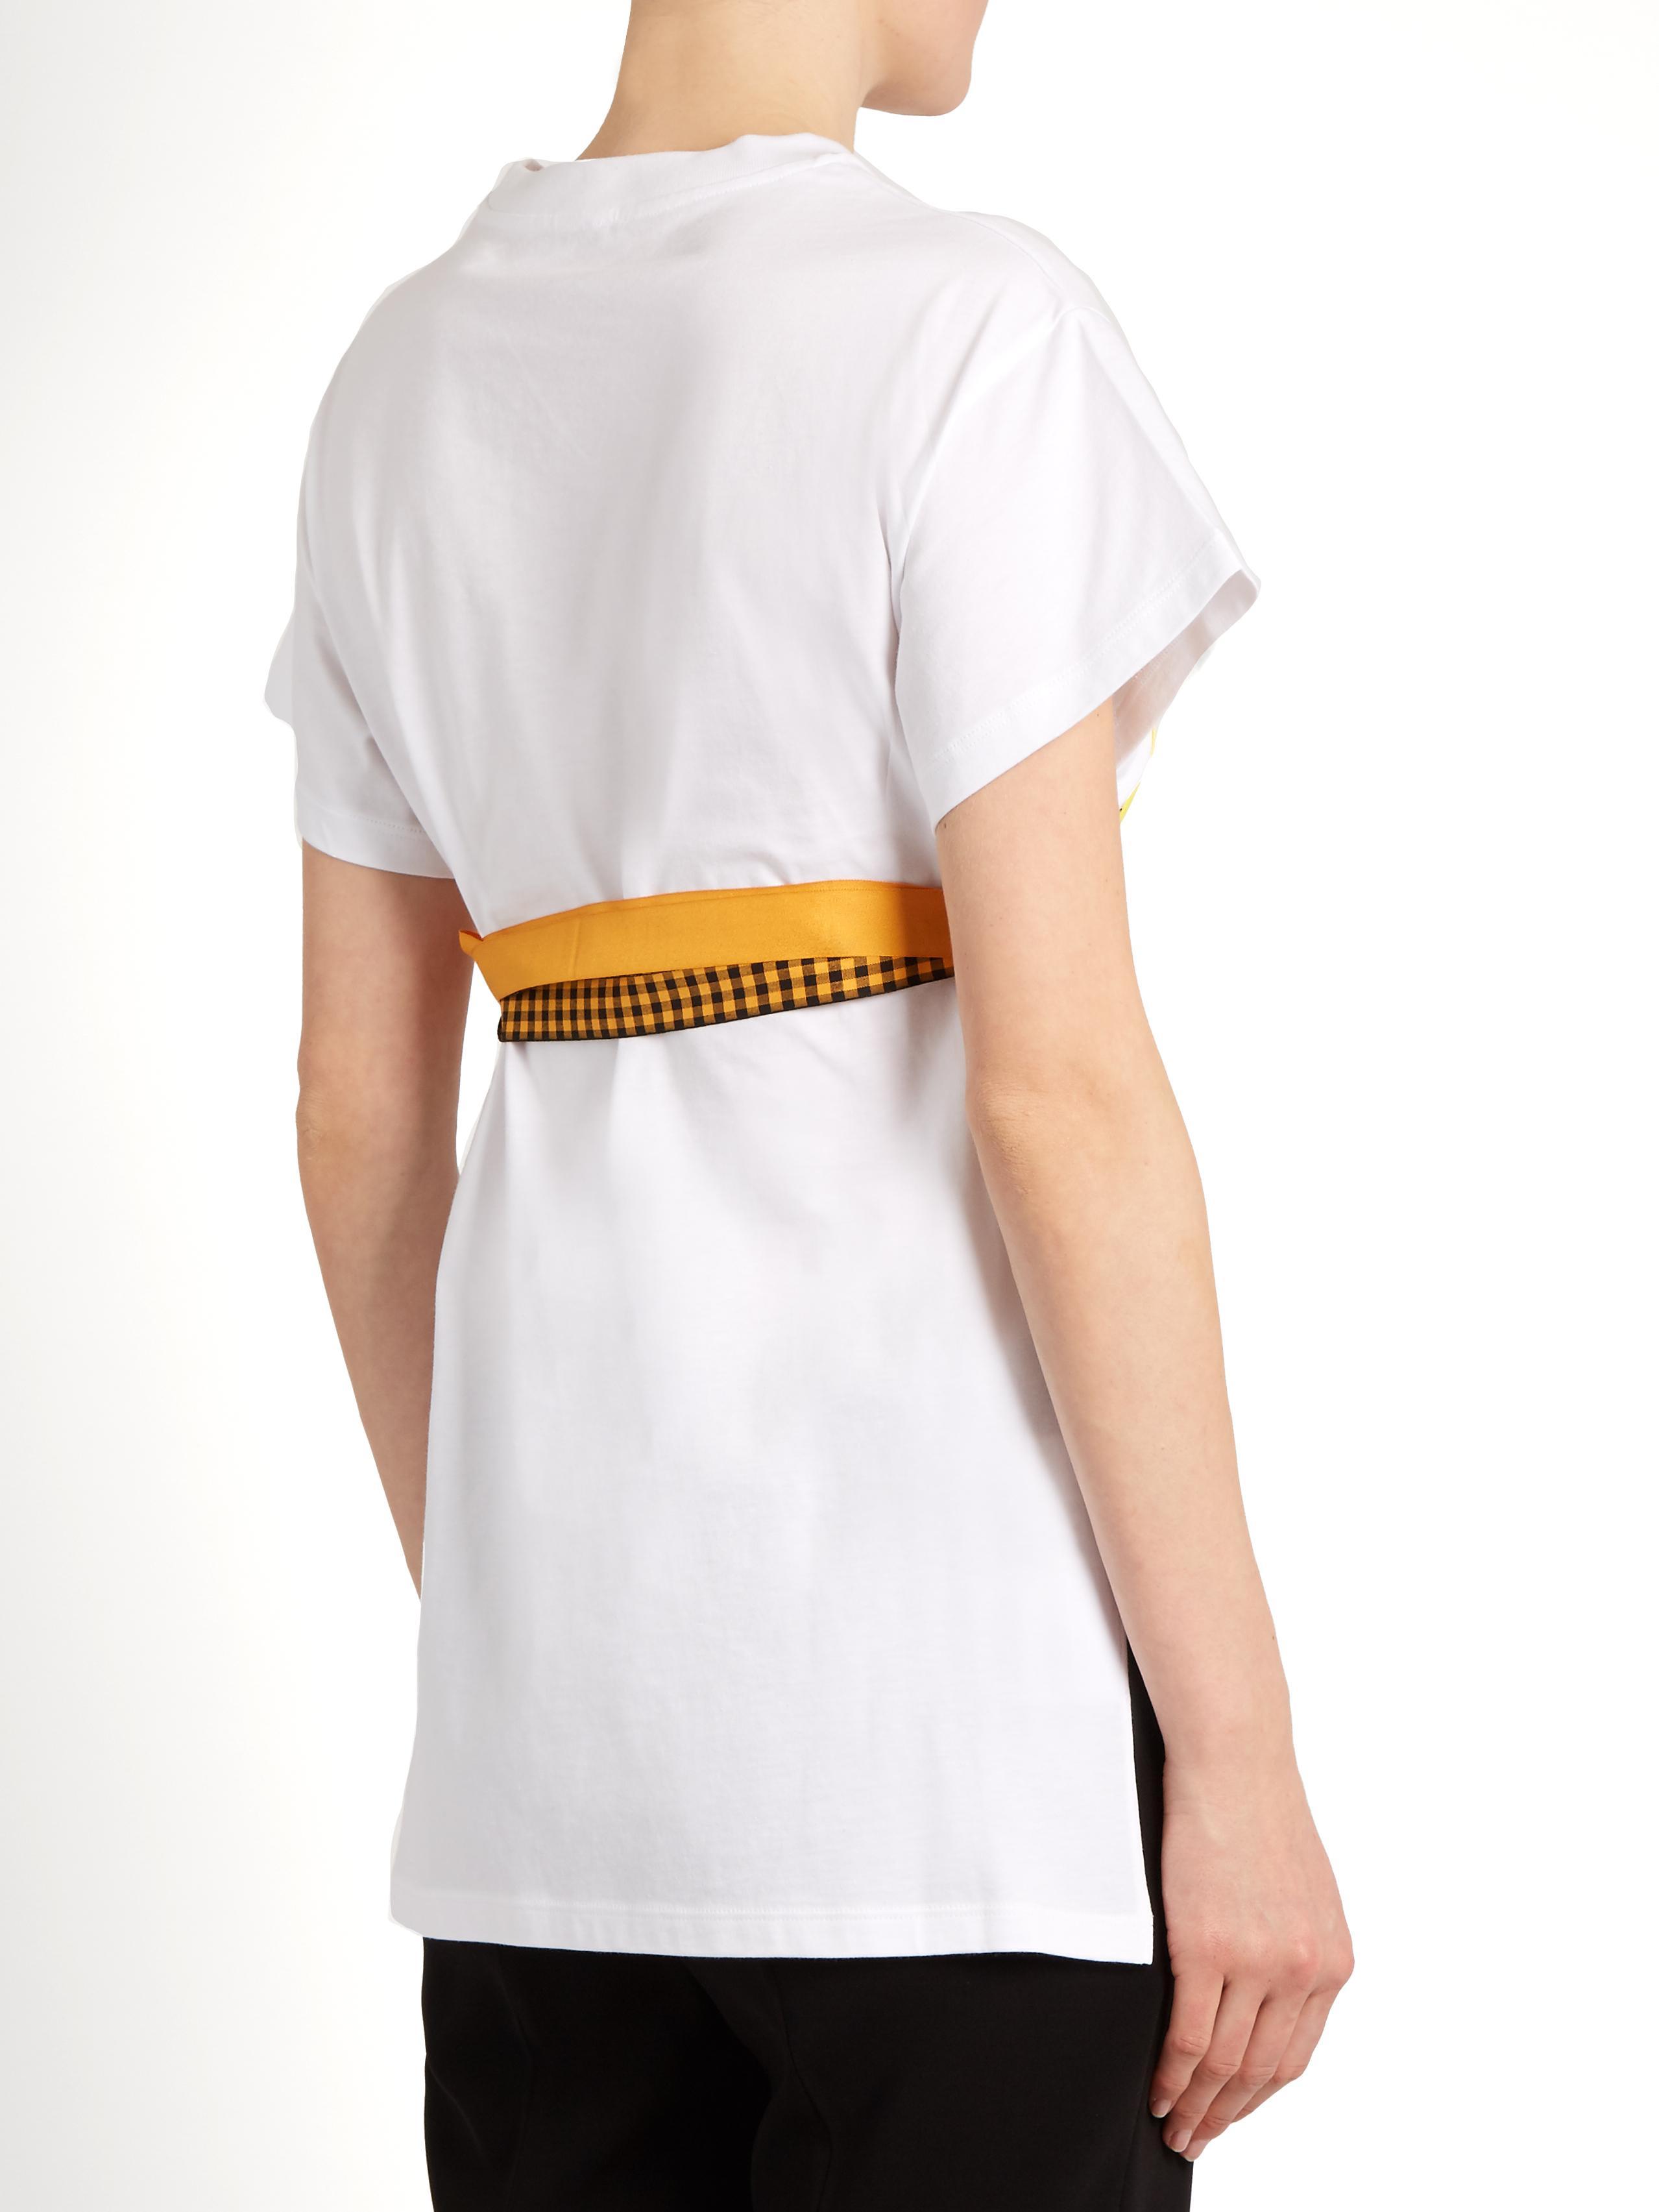 Miu miu pegasus print cotton jersey t shirt in white lyst for Miu miu t shirt